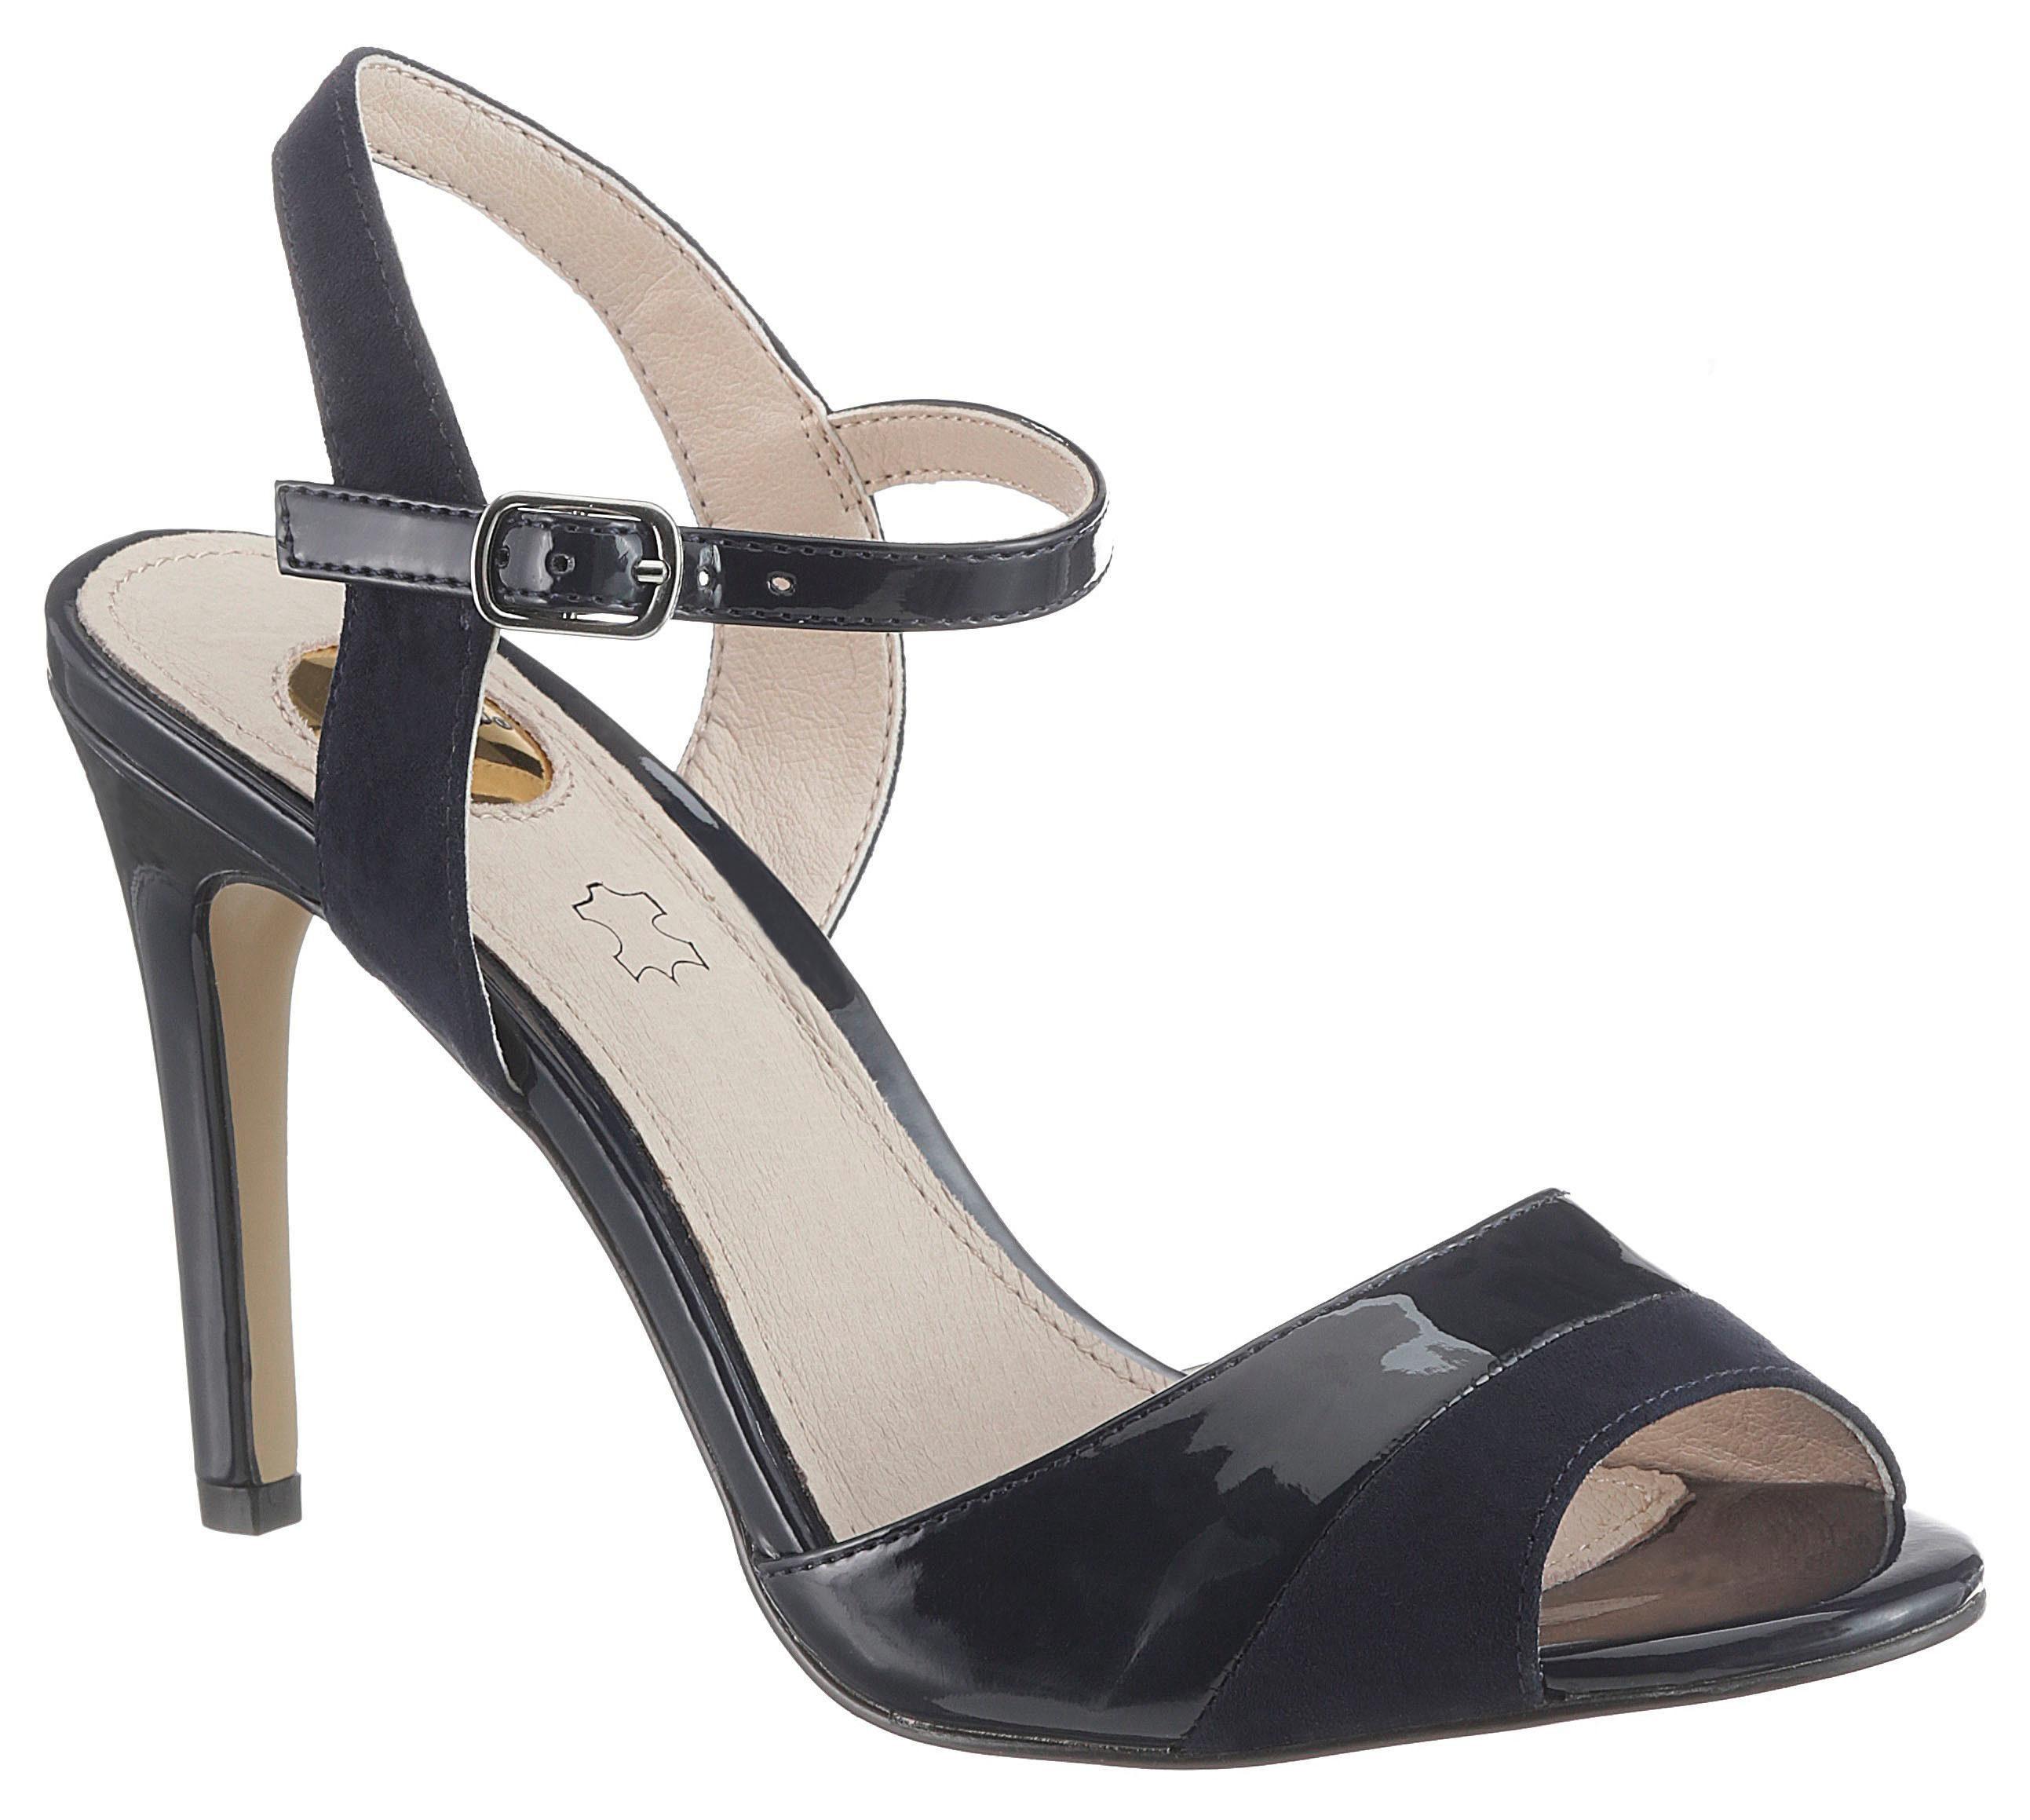 Materialmix High Online Eleganten Buffalo Sandalette KaufenOtto Im Heel PnwkO0